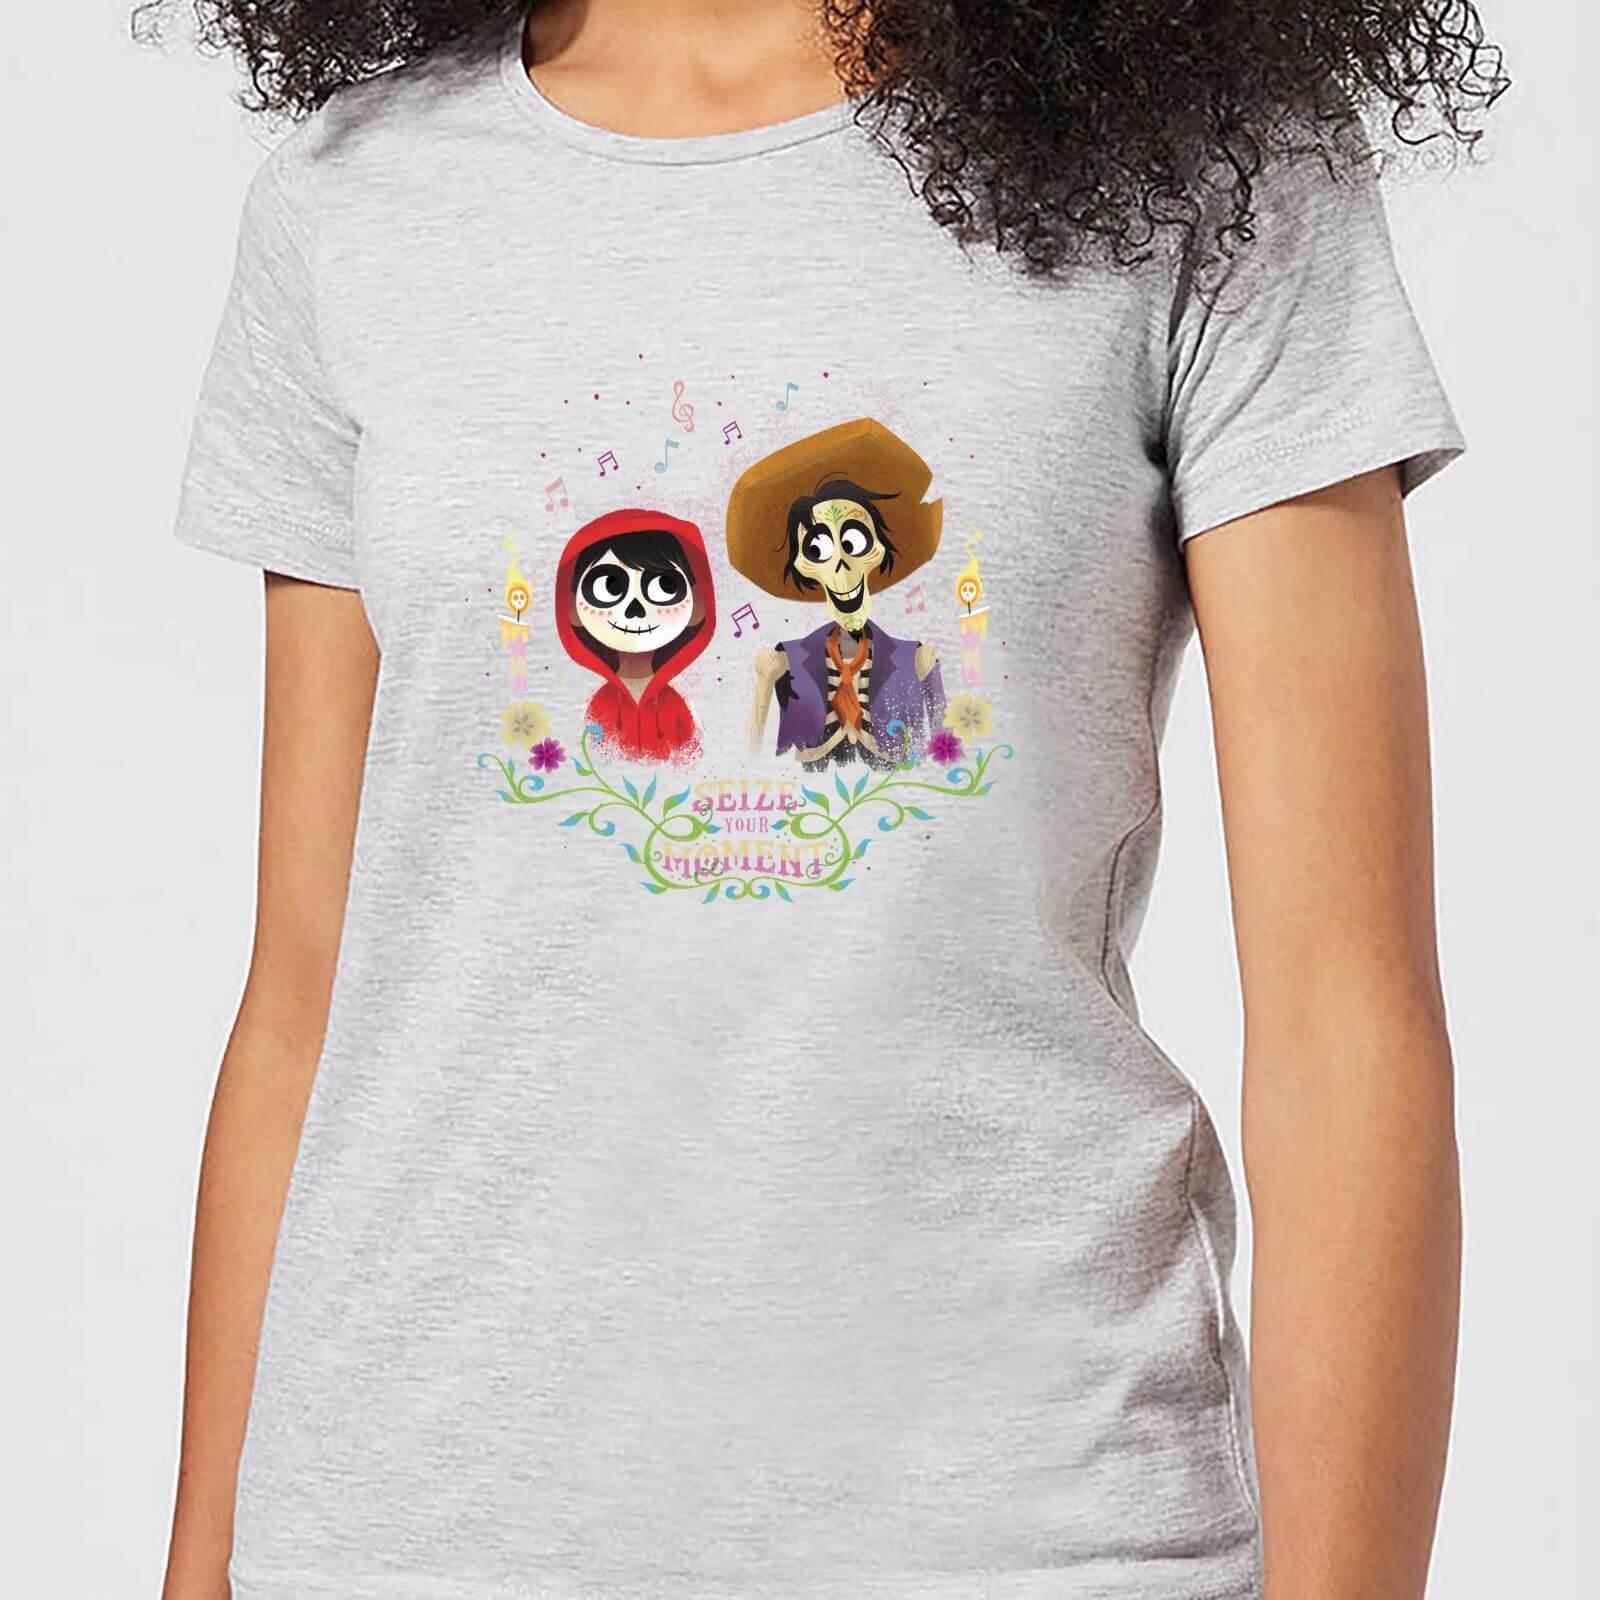 Disney Coco Miguel And Hector Women's T-Shirt - Grey - L - Grey